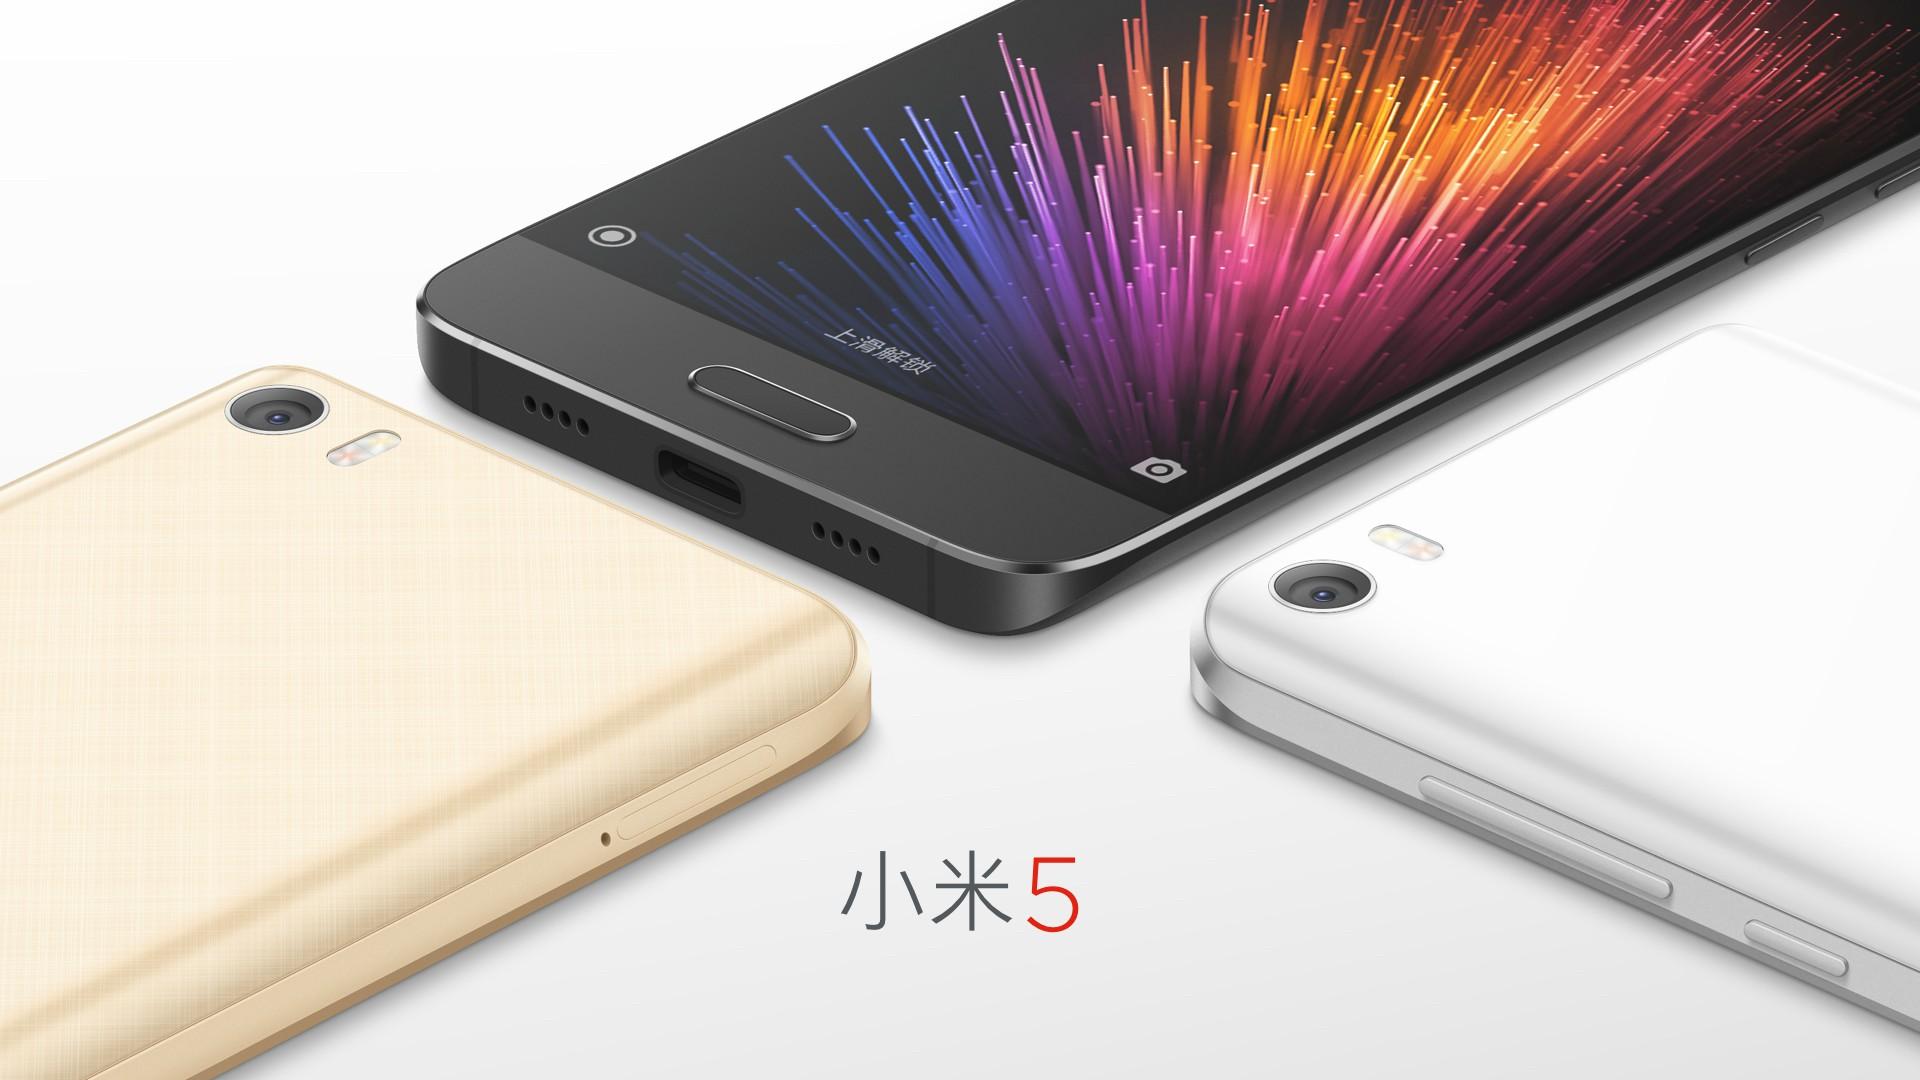 Xiaomi's 'most beautiful' flagship rocks a Snapdragon 820